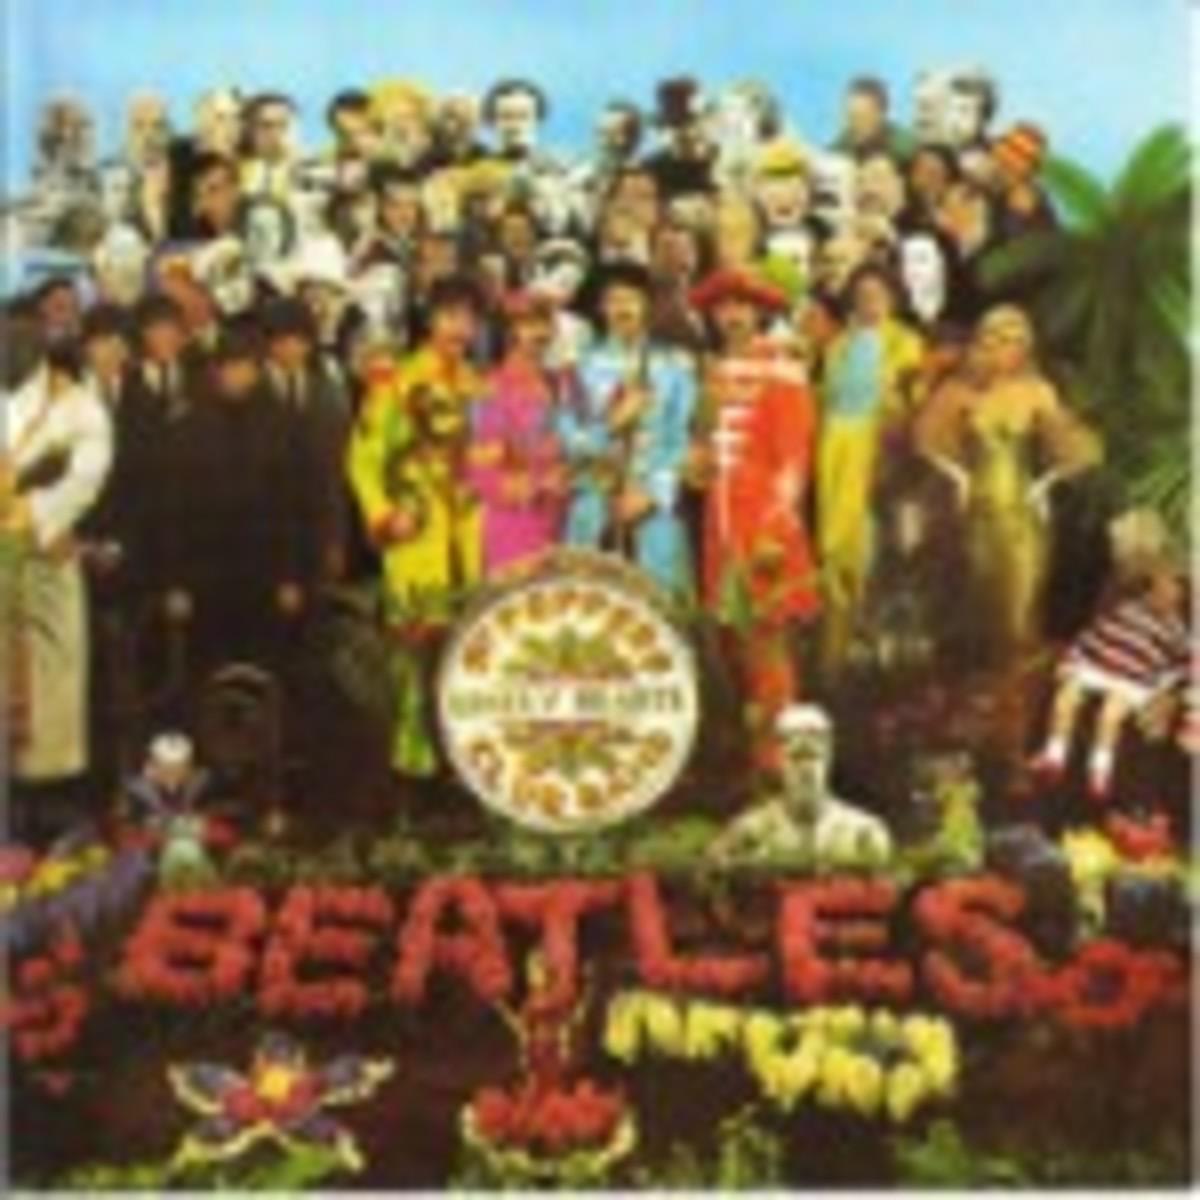 Beatles_SgtPepper